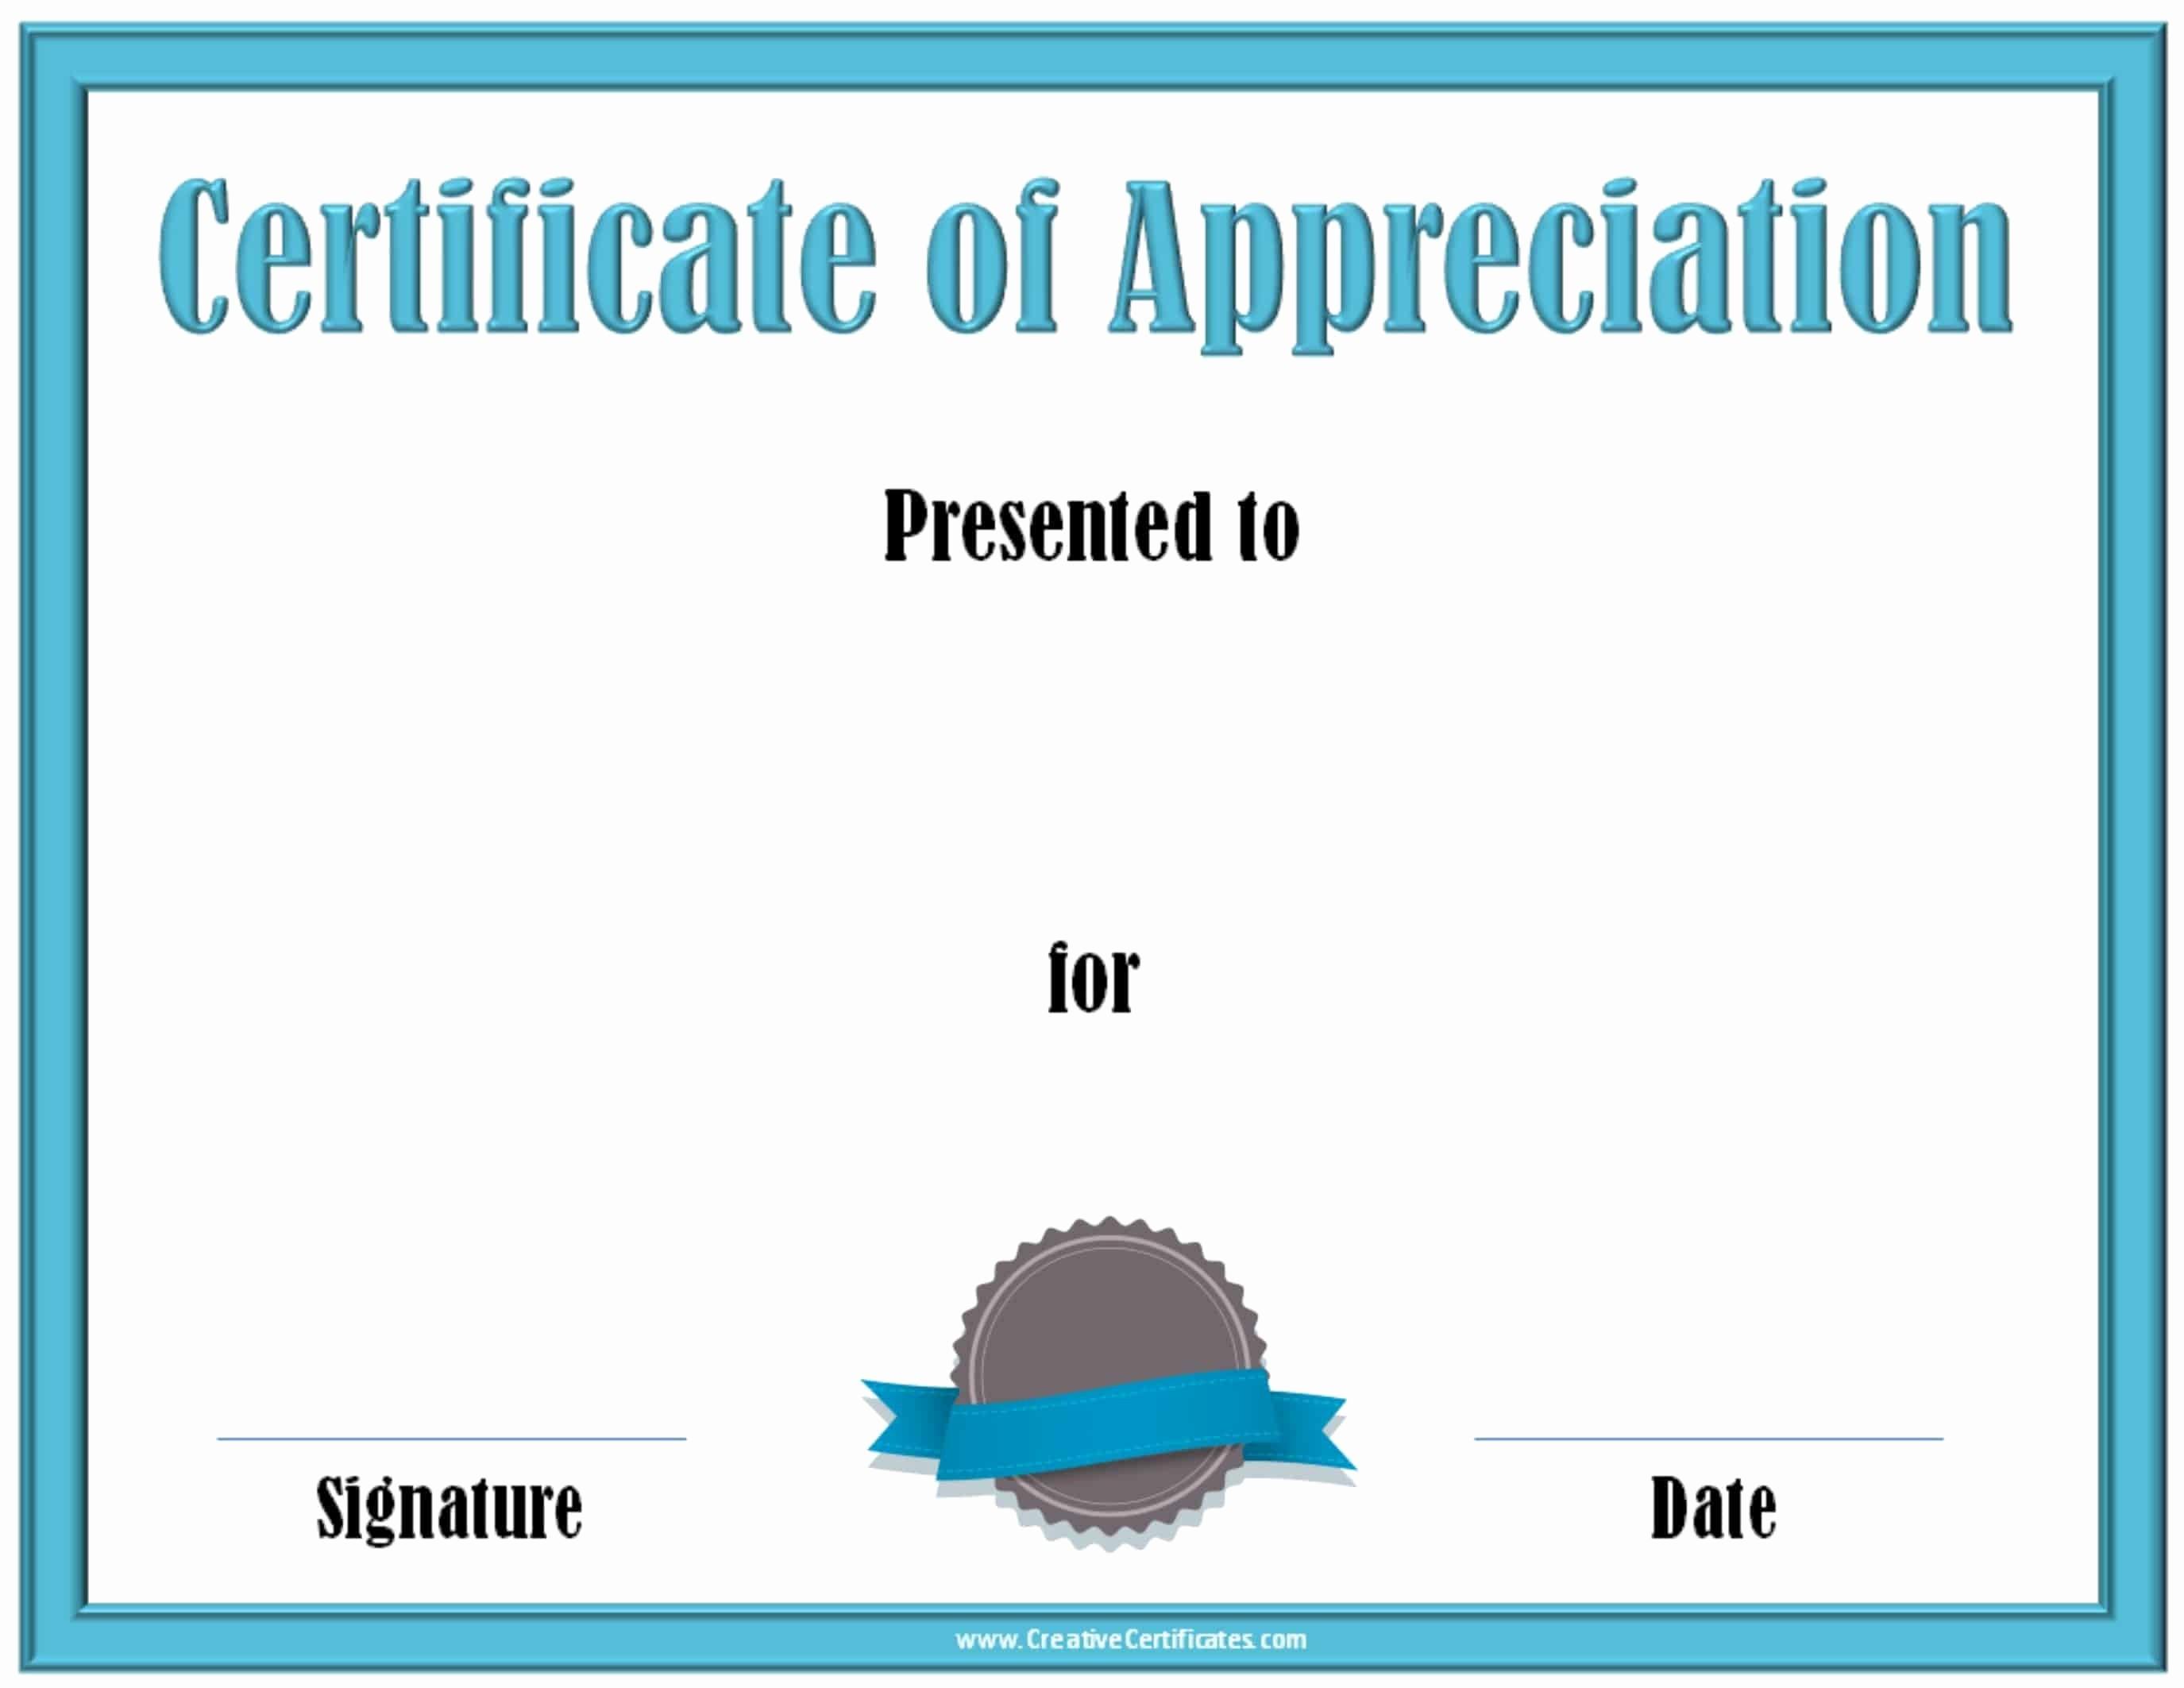 Free Downloadable Certificates Of Appreciation Best Of Free Editable Certificate Of Appreciation